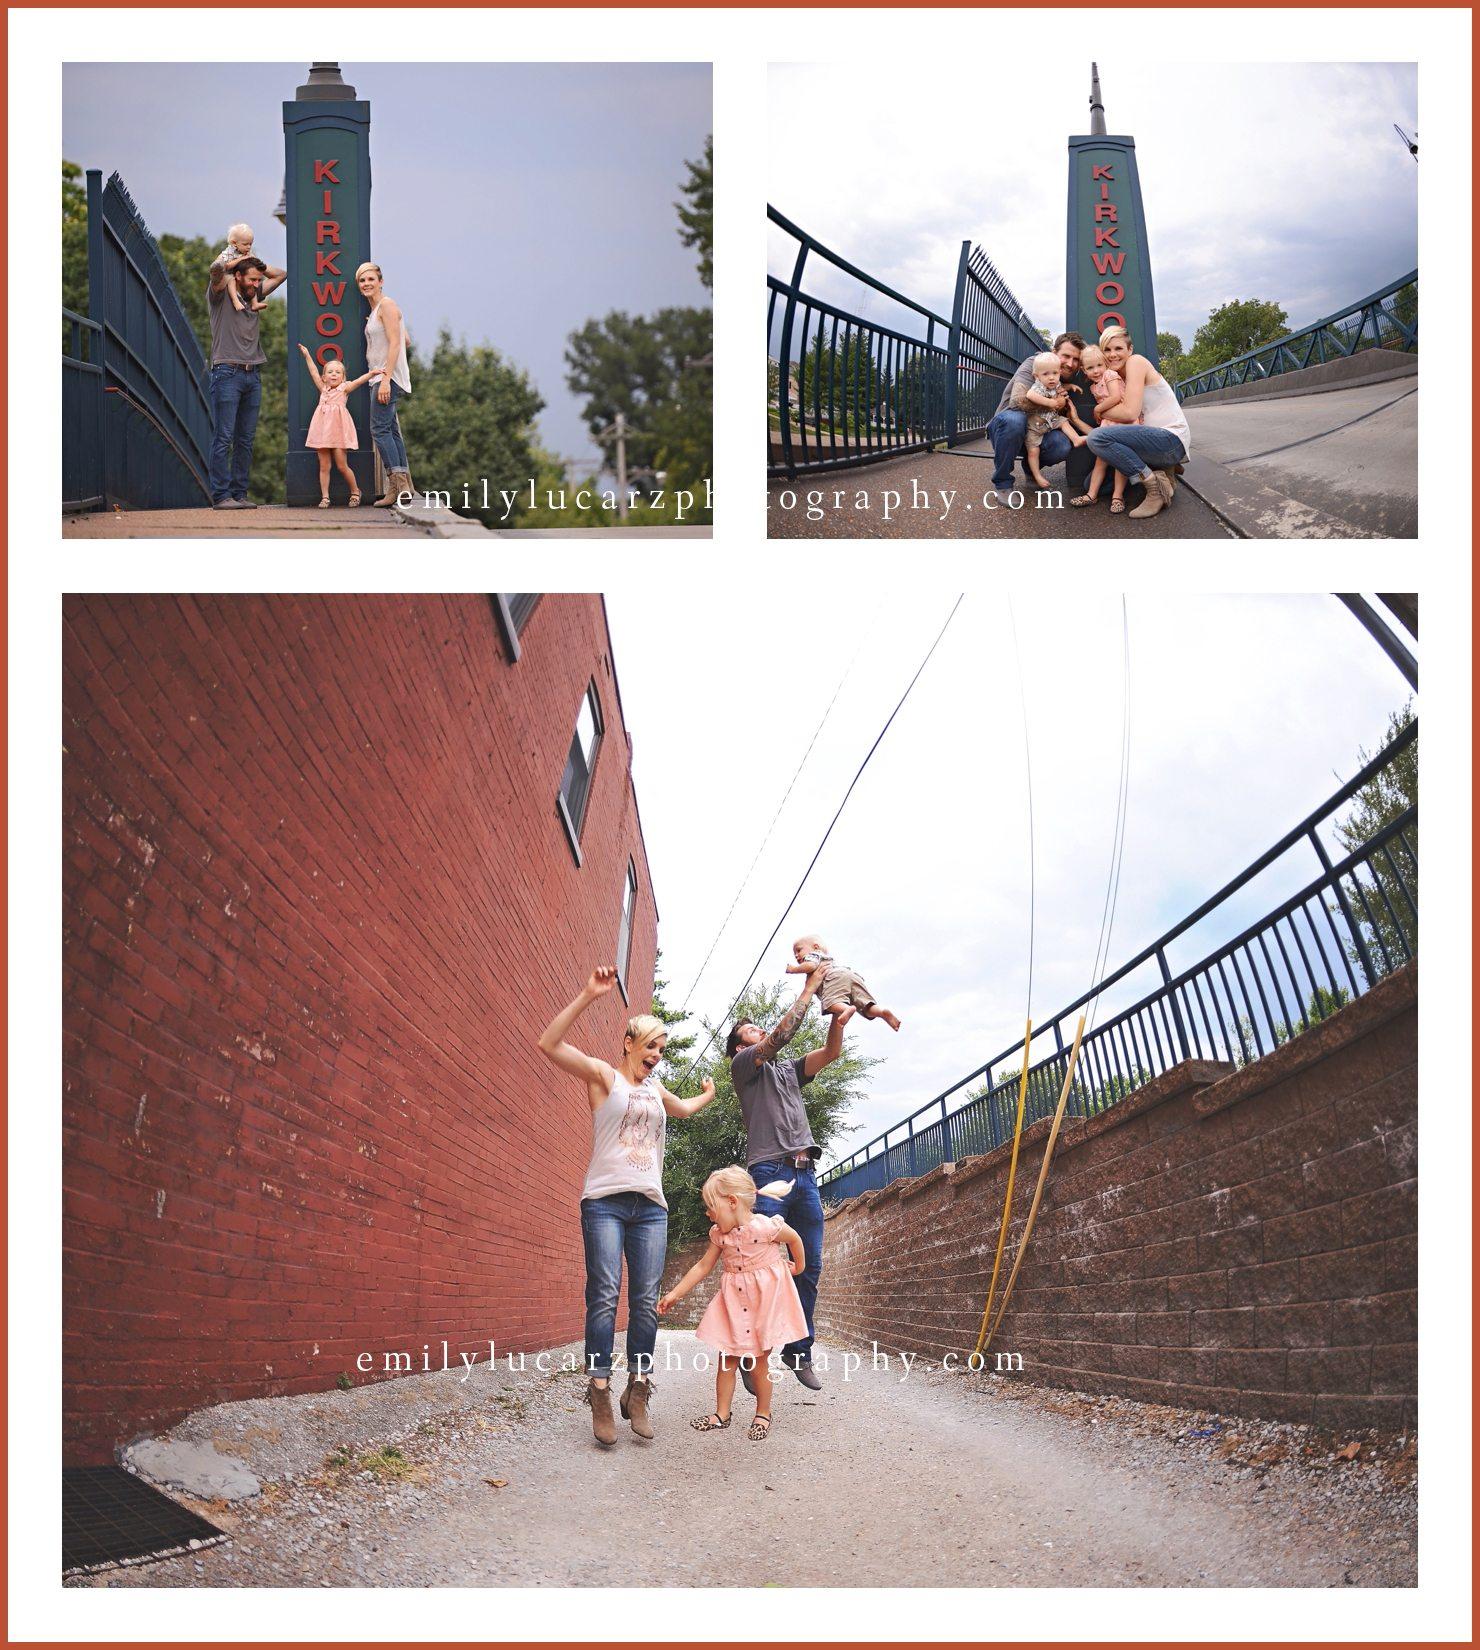 Kirkwood Family Photographer